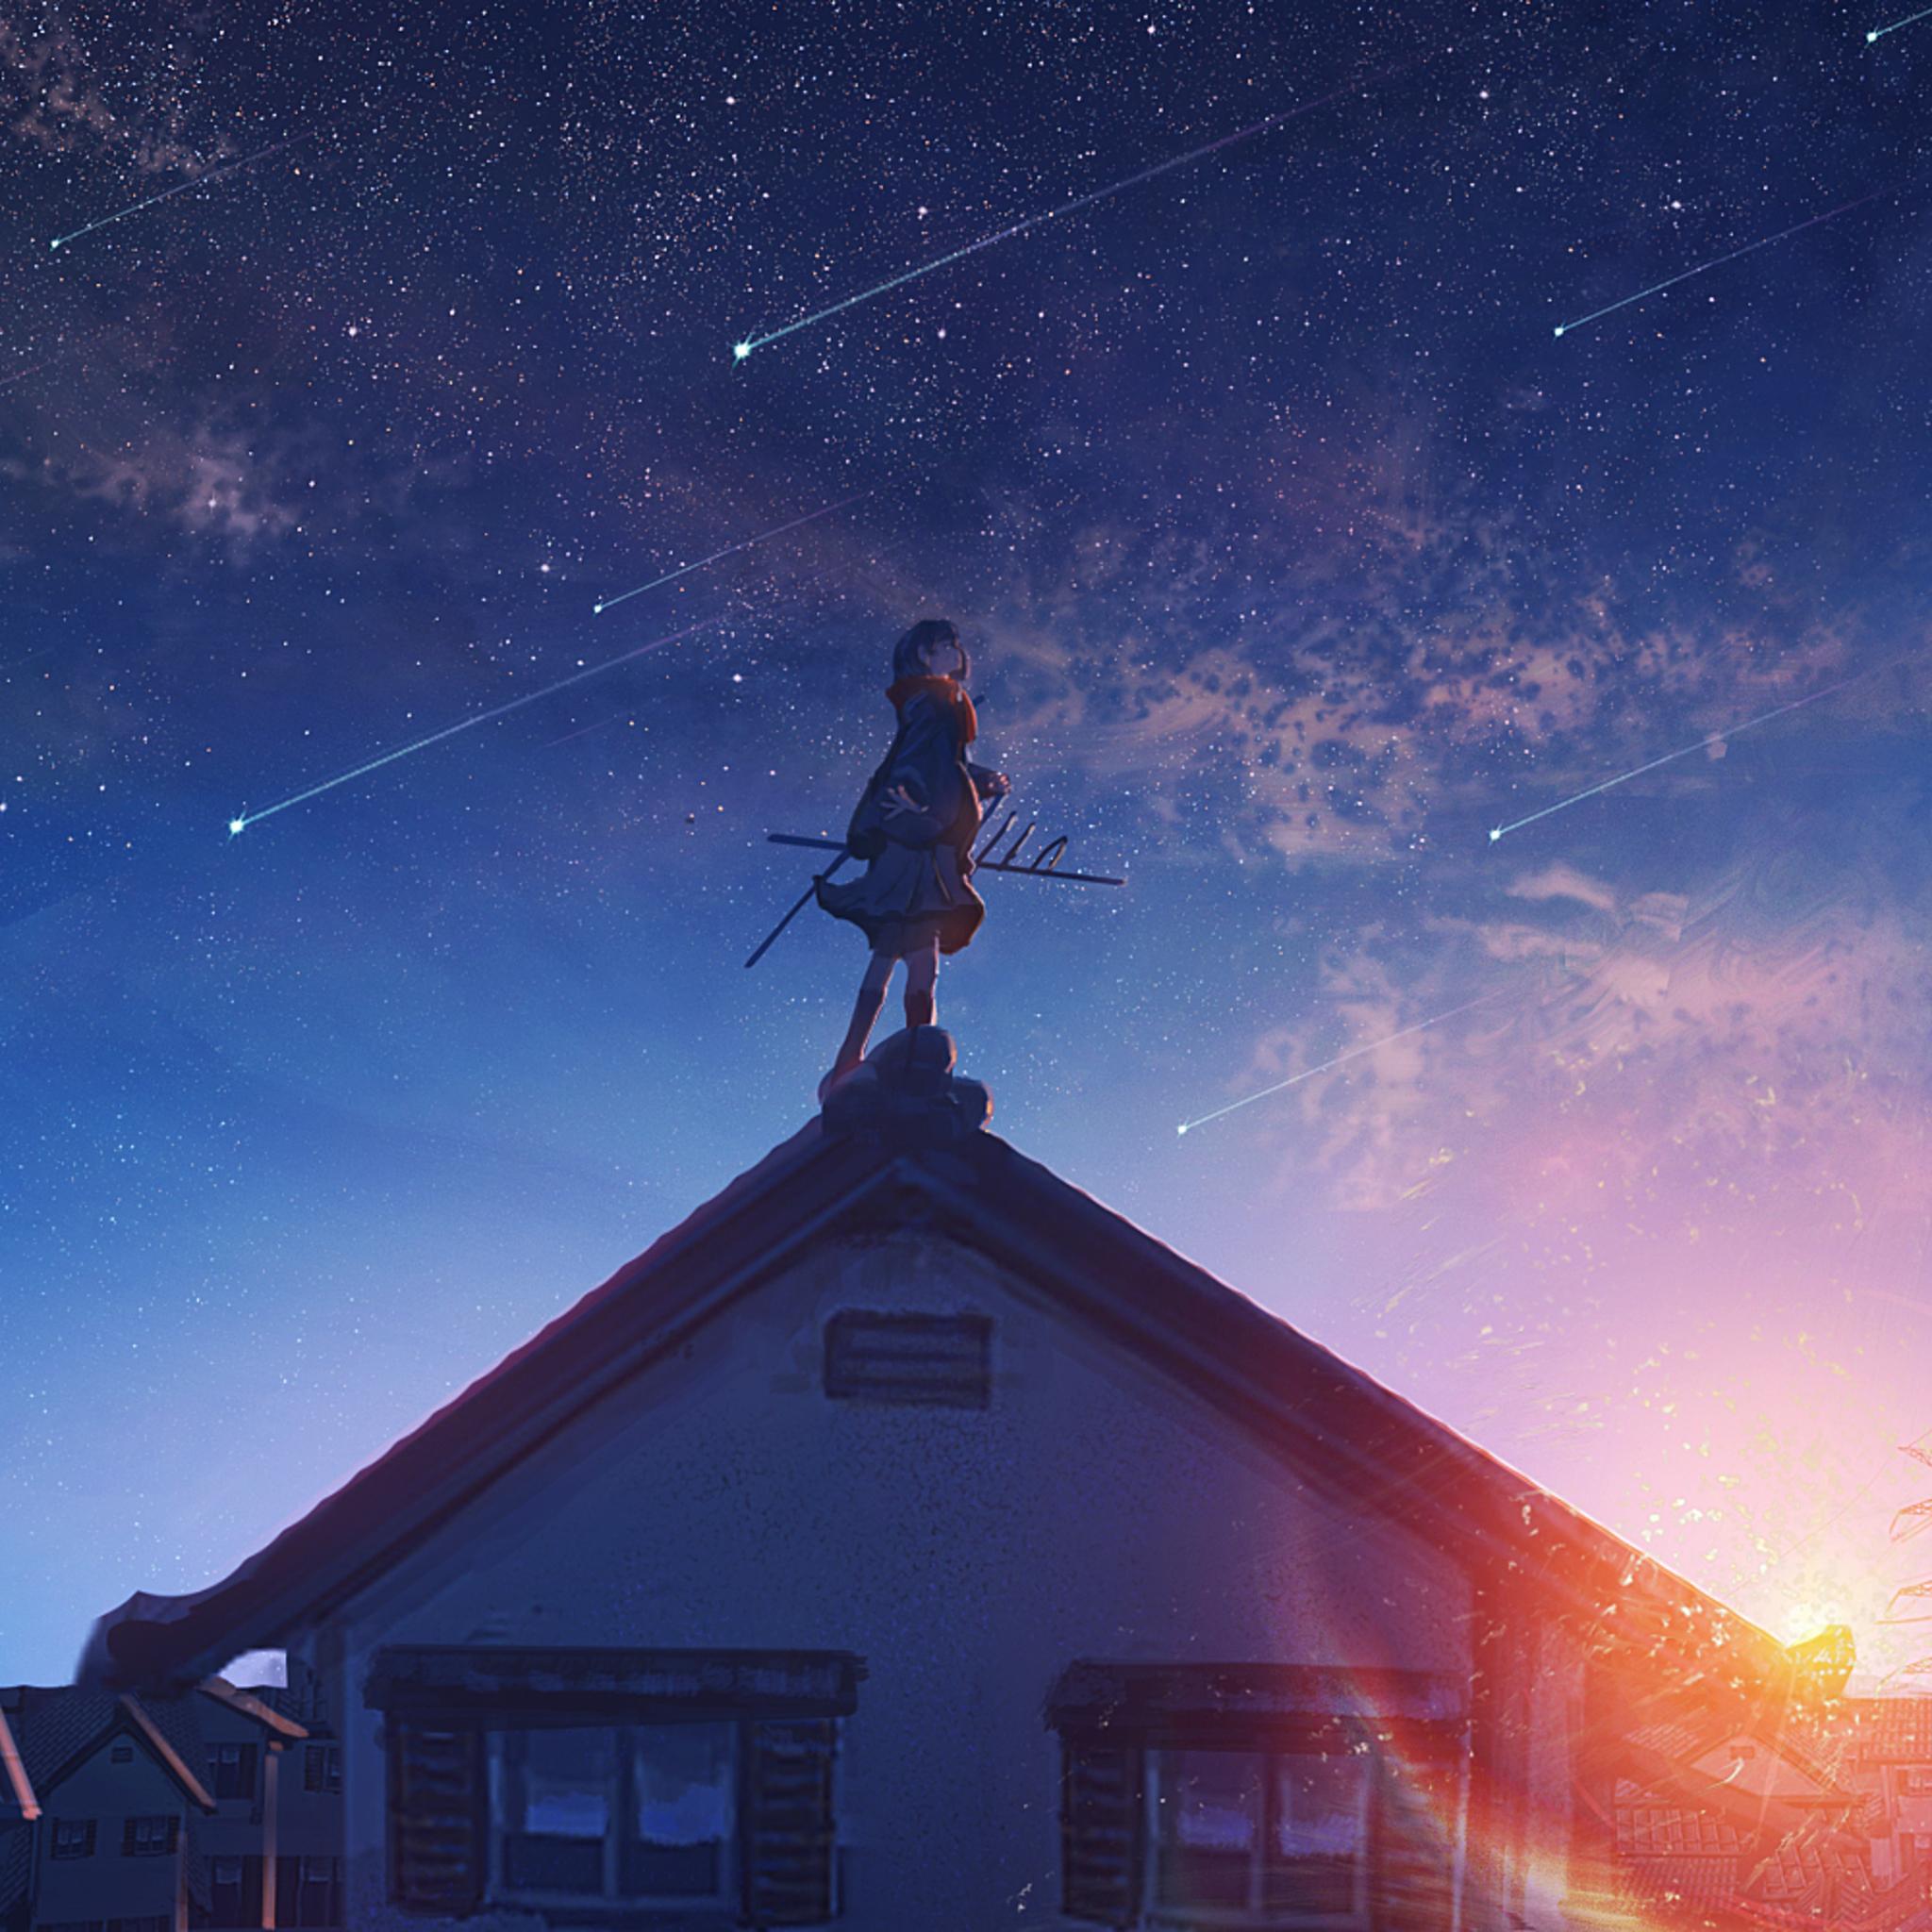 2048x2048 Anime Original Girl Shooting Star Ipad Air Hd 4k